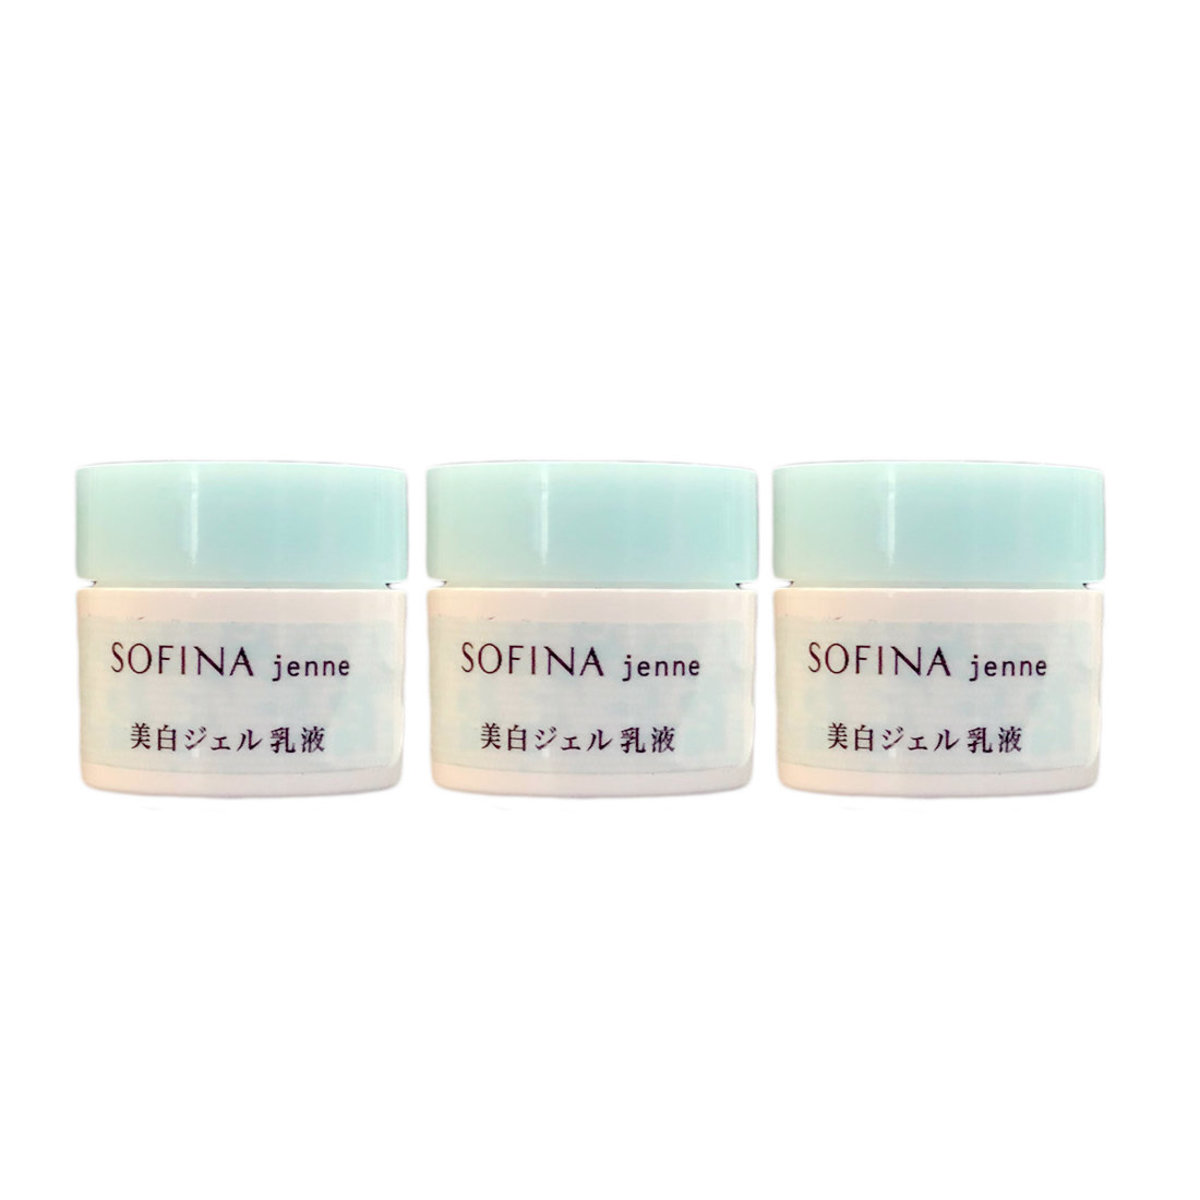 Jenne whiteing jelly moisturizer 3g x 3